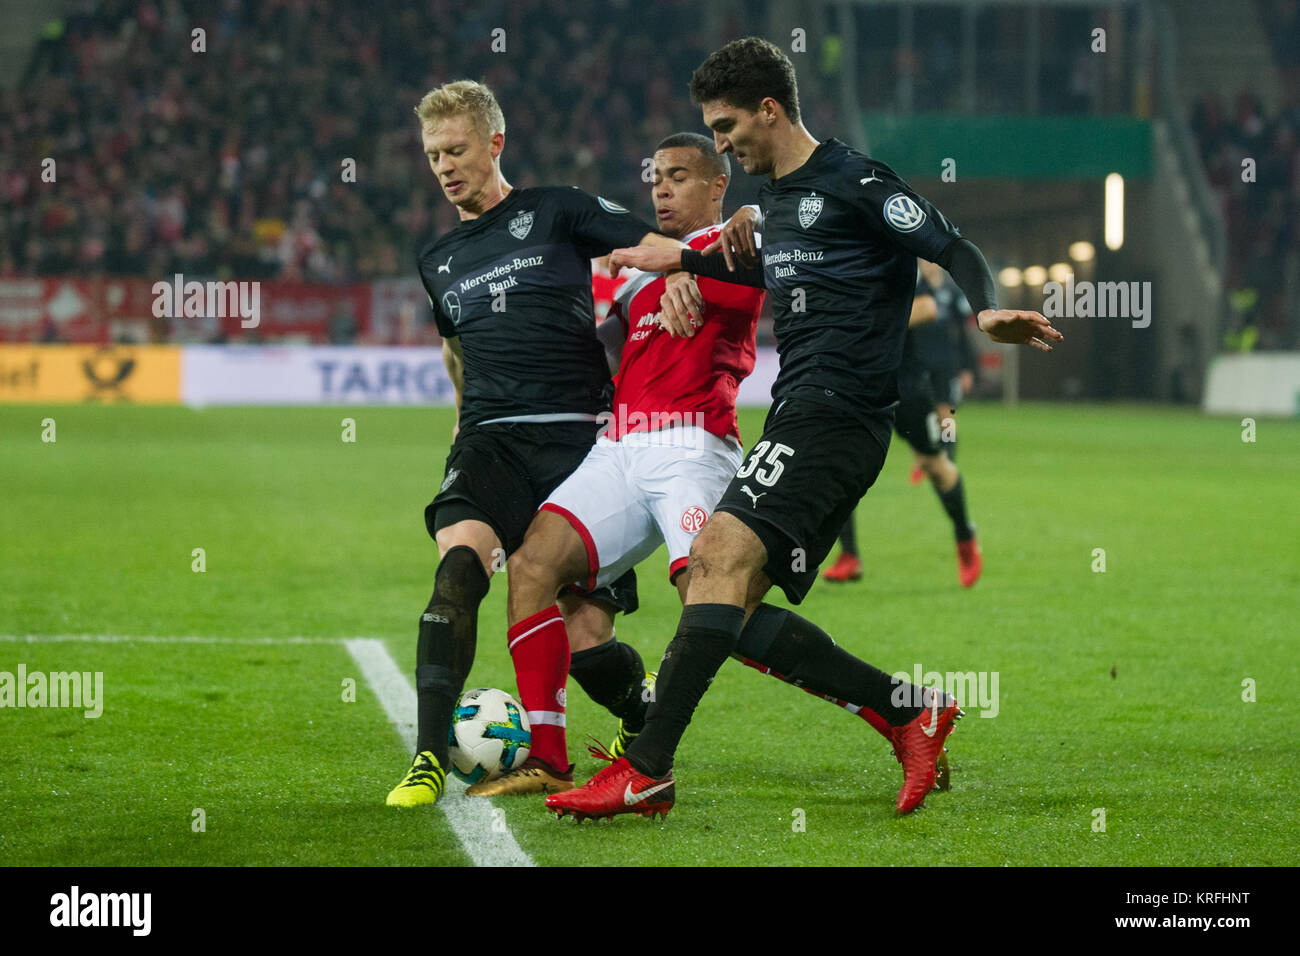 Robin QUAISON (mi., MZ) versus Timo BAUMGARTL (li., S) und Marcin KAMINSKI (S), Aktion, Kampf um den Ball, Fussball, - Stock Image